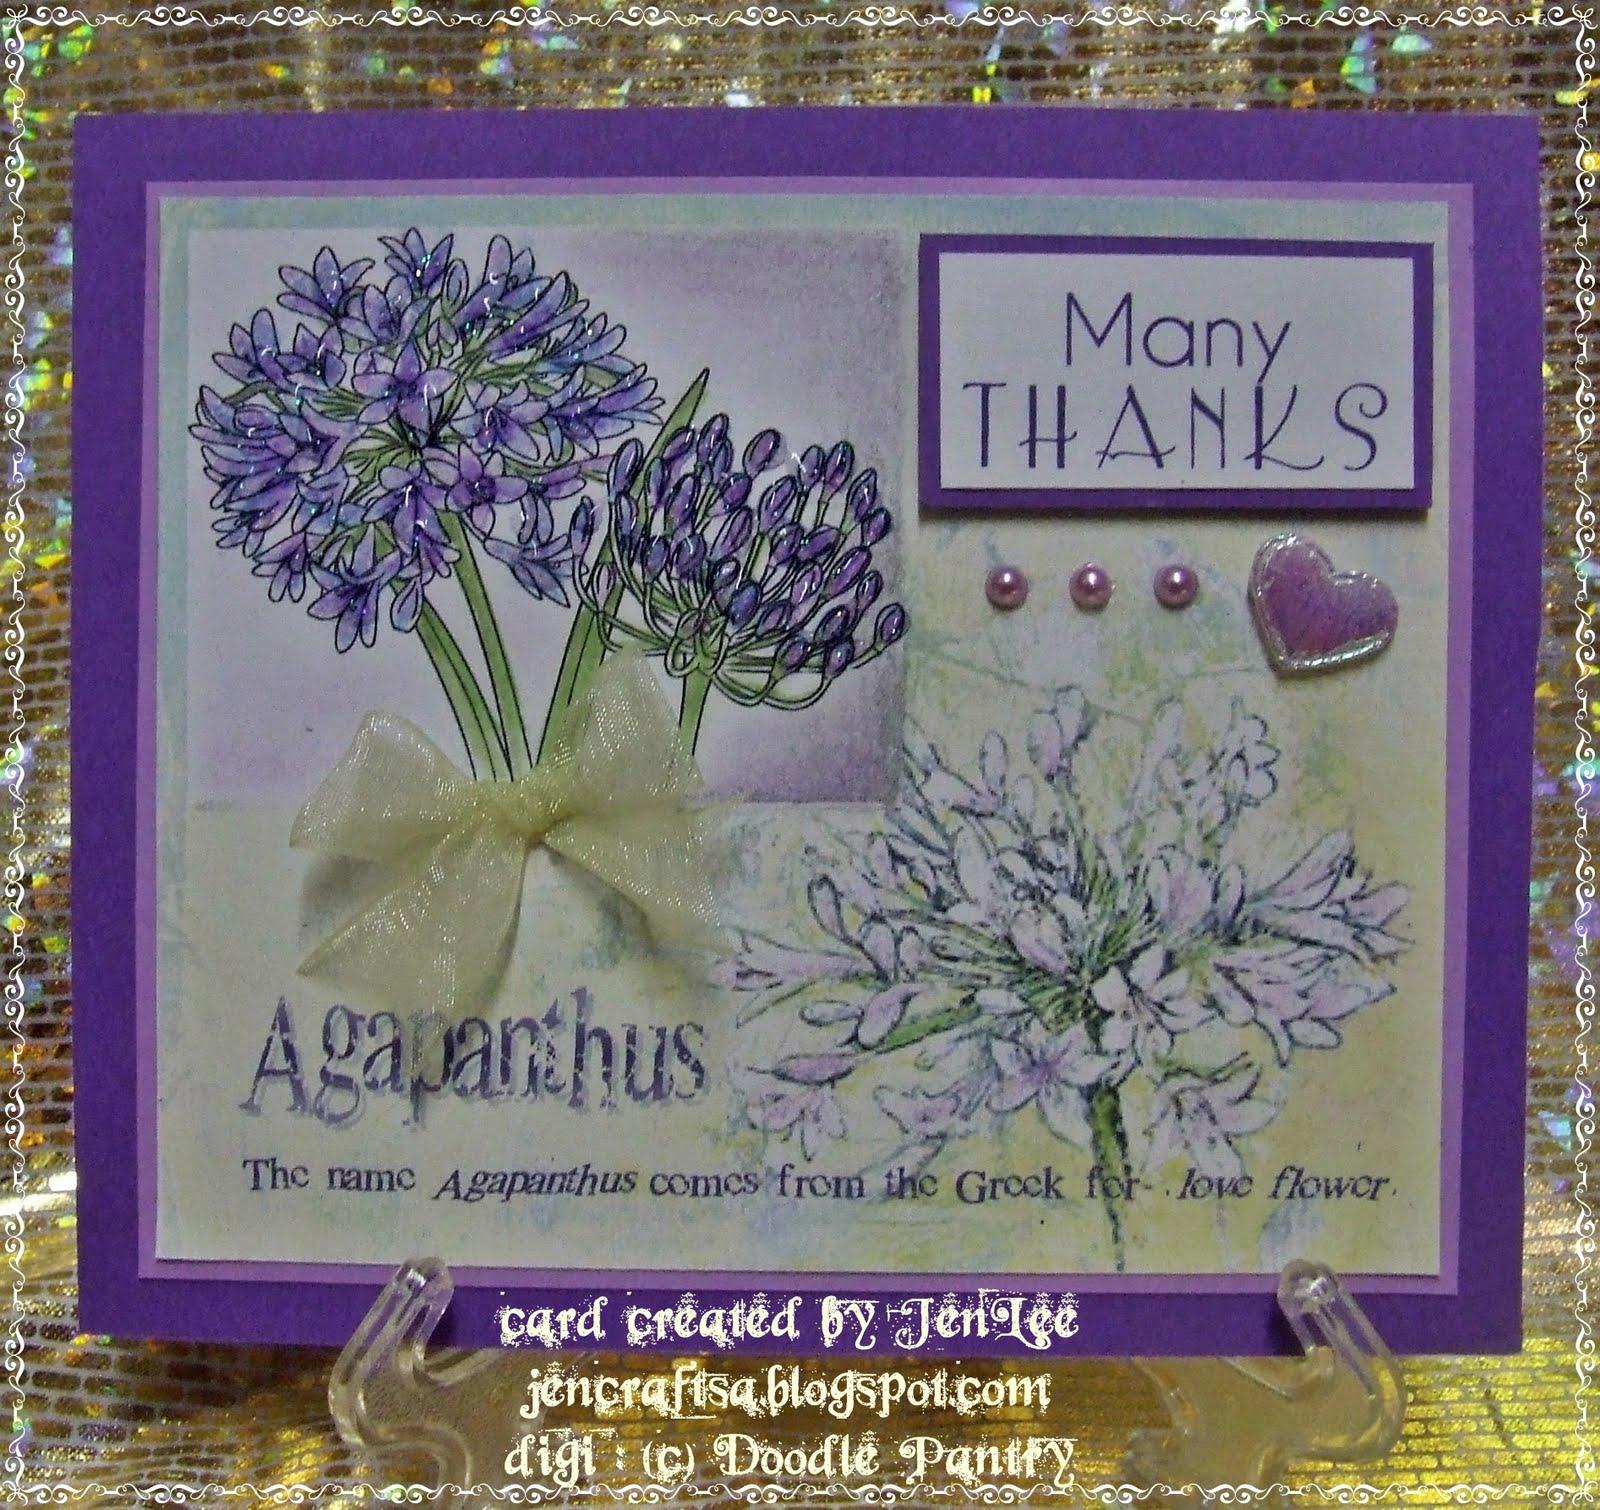 http://4.bp.blogspot.com/_VGiSt37oAv4/TKtONIuCHpI/AAAAAAAAANo/AE15_FkfLcs/s1600/AGAPANTHUS+CARD+-+Doodle+Pantry+Digi.JPG